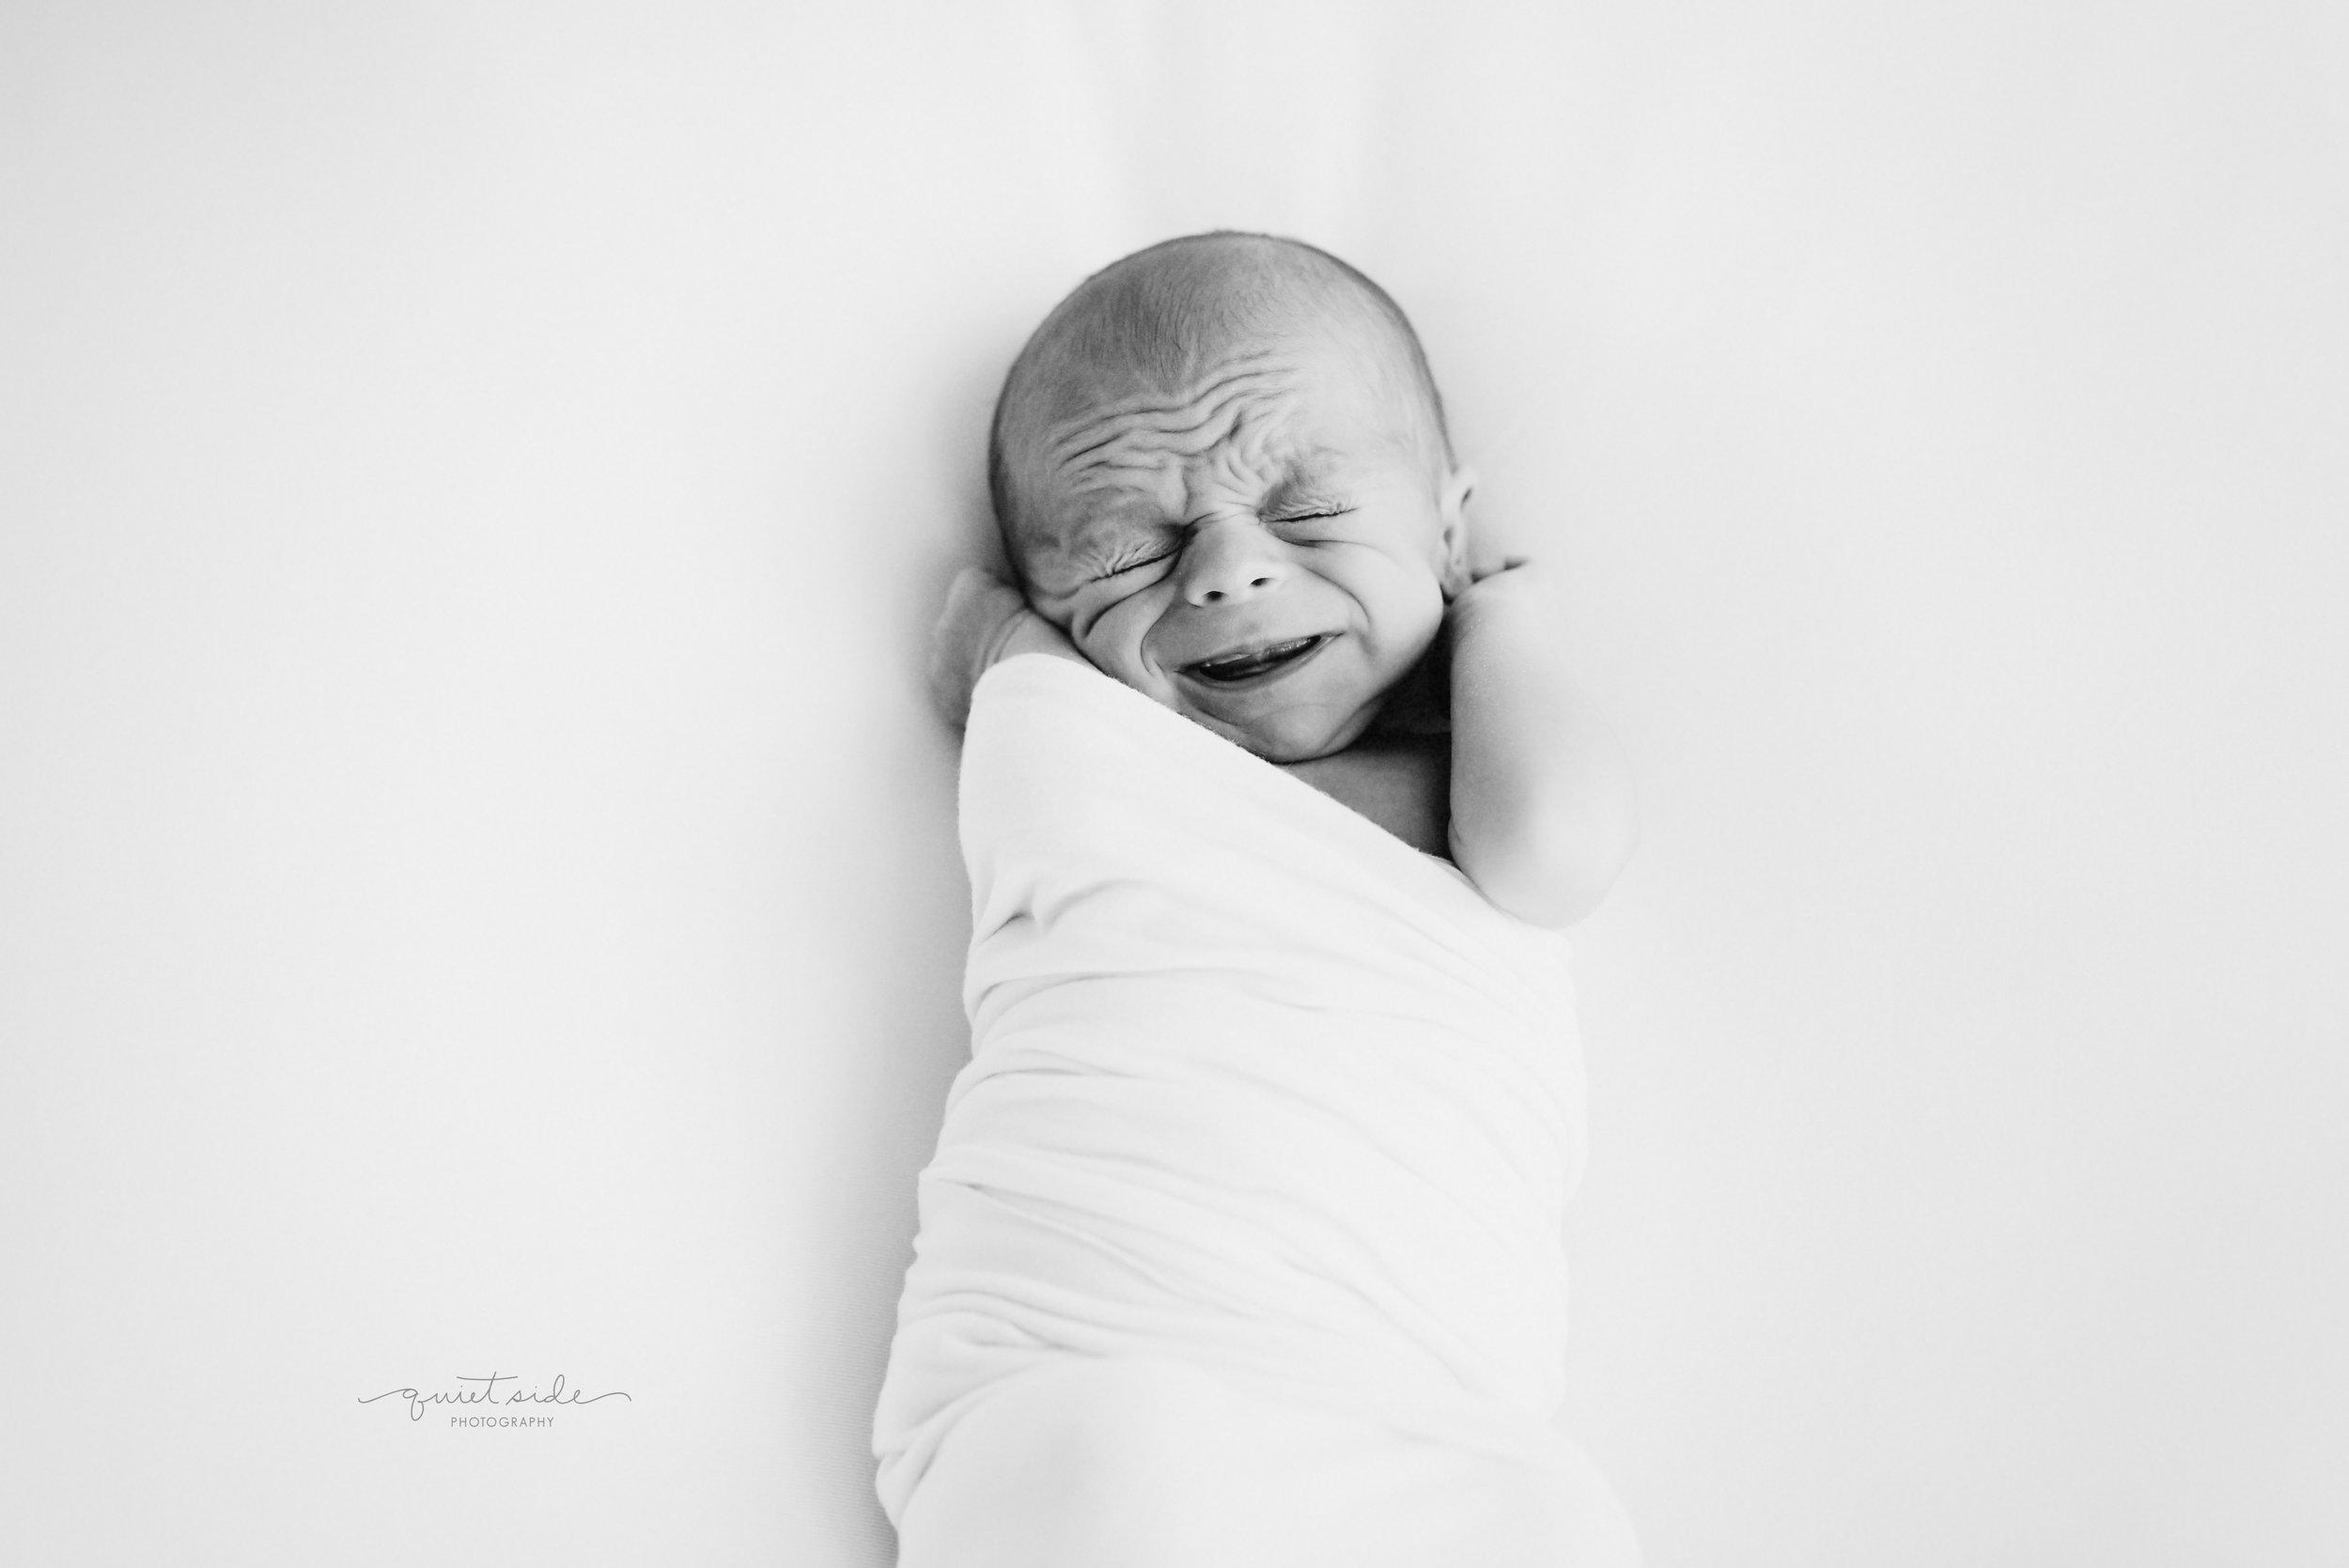 quietsidephotography-newborn-studio-loudouncountyva-alexandria-simplenewborn-grant.jpg